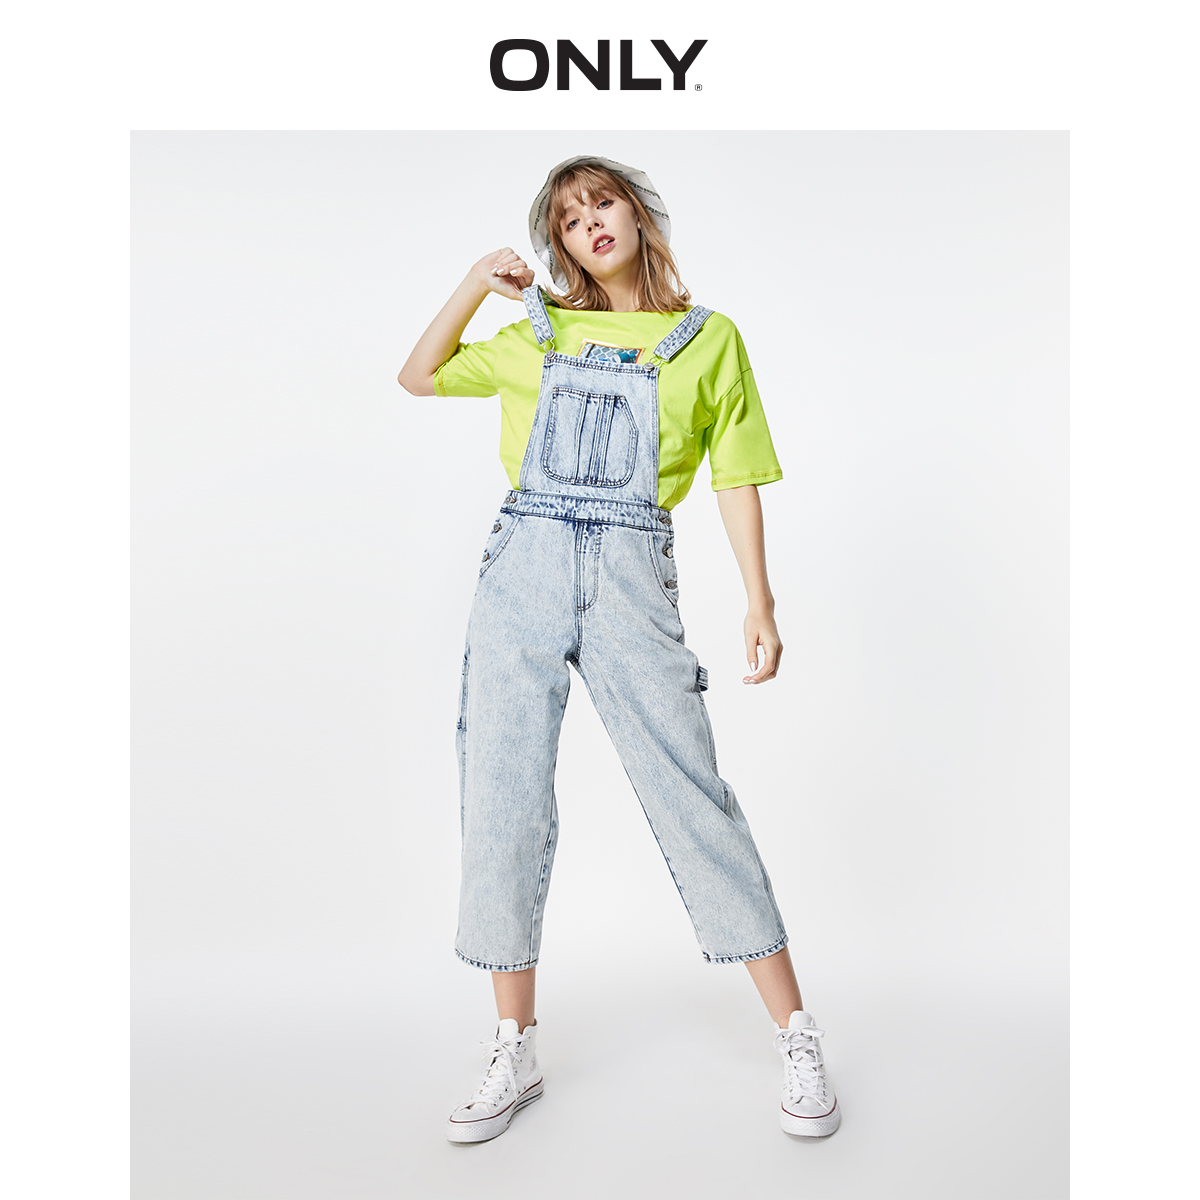 ONLY Women's Distressed Light Color Capri Denim Overalls |11937K501